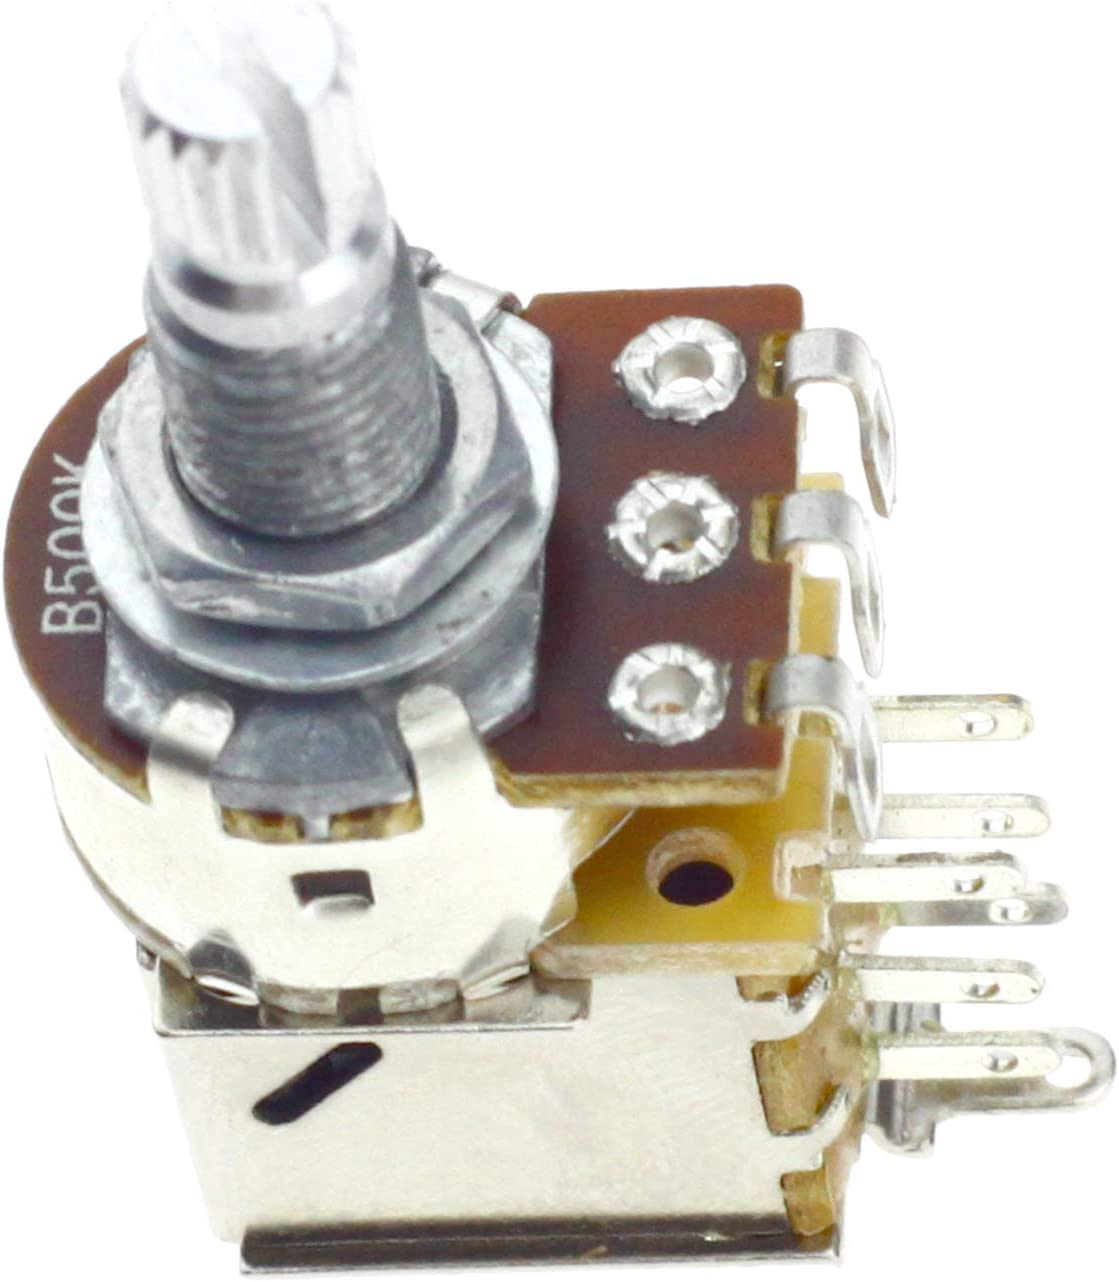 2pcs A250K Push-Pull-Gitarre Kontrolle Topf Potentiometer Für Elektrische